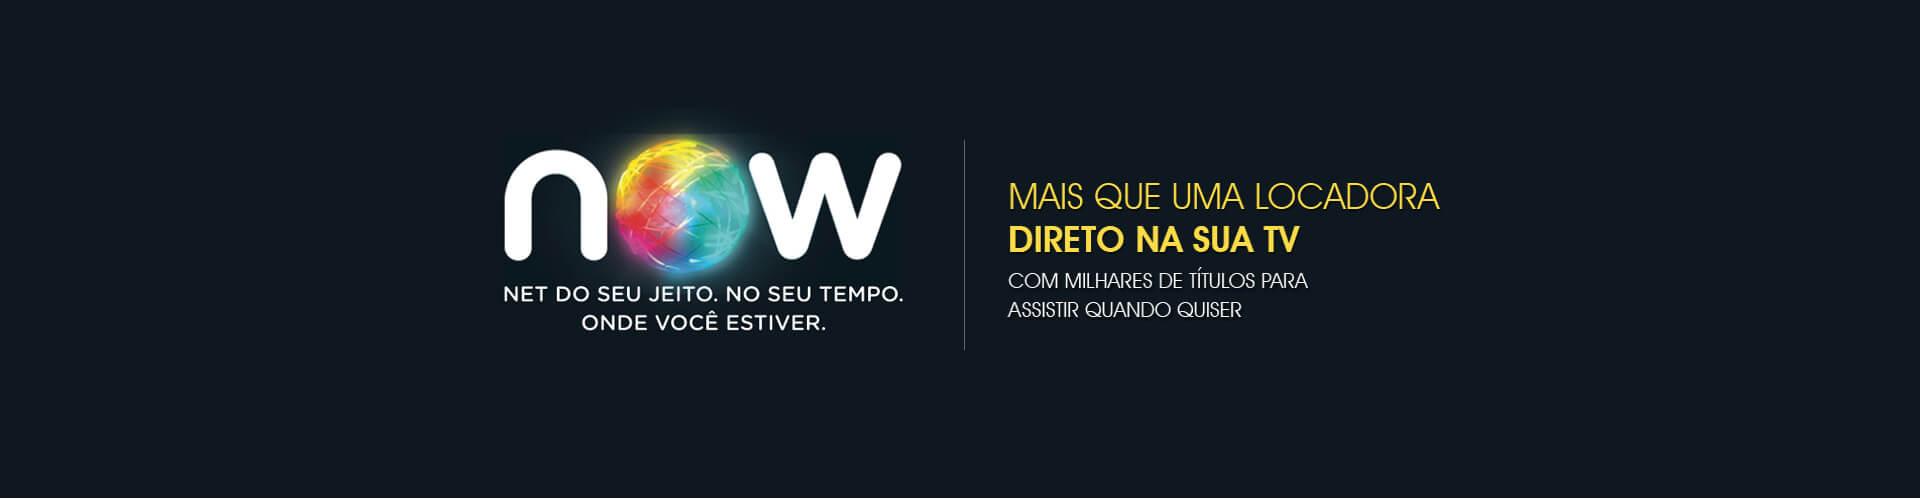 canal-net-now-net-porto-velho